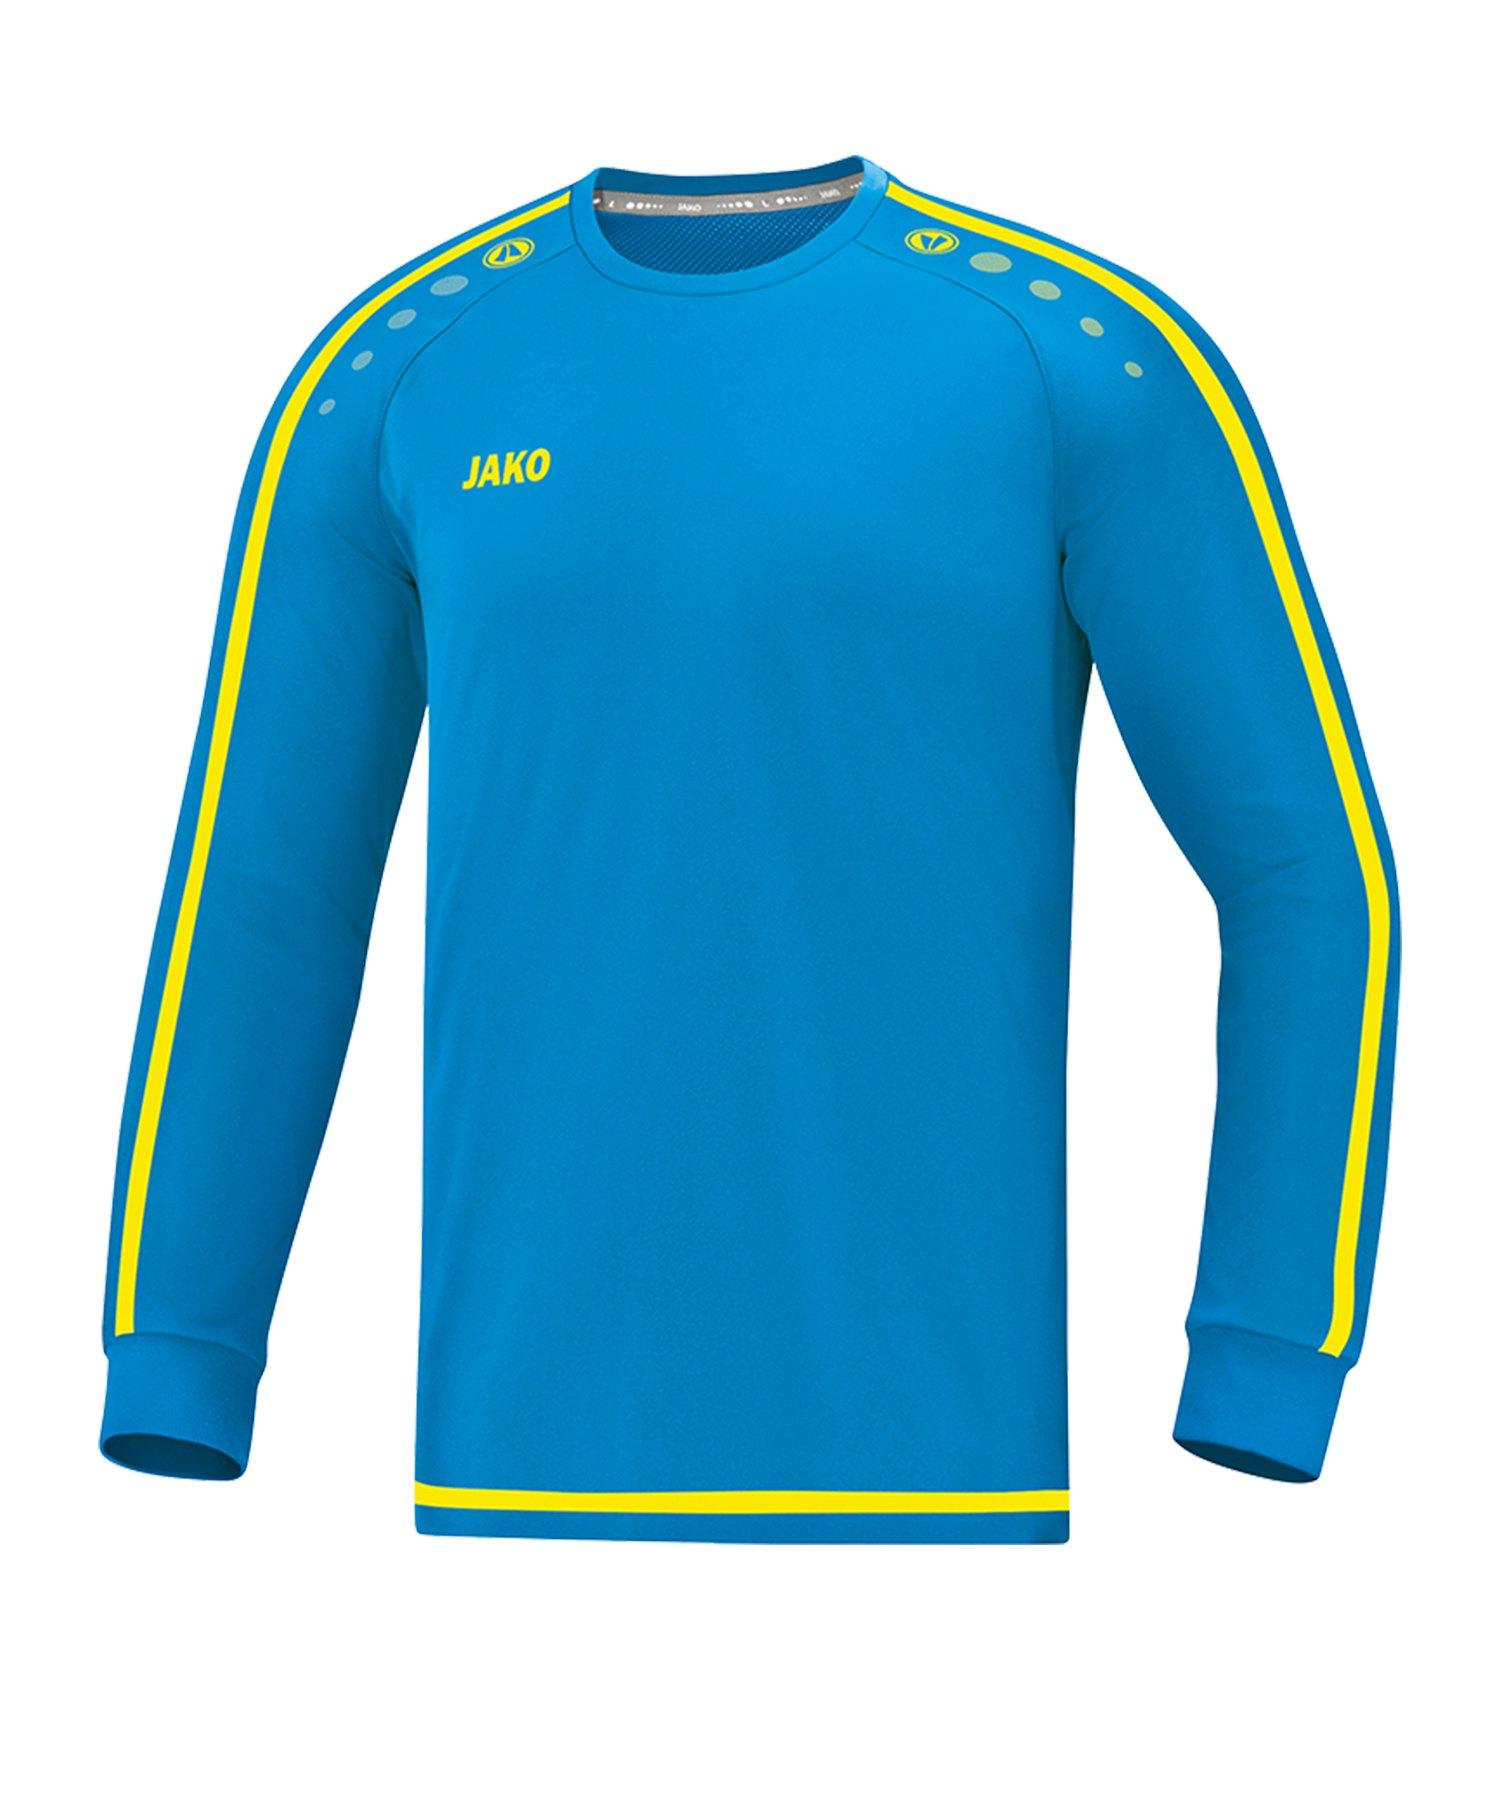 Jako Striker 2.0 Trikot langarm Kids Blau Gelb F89 - Blau